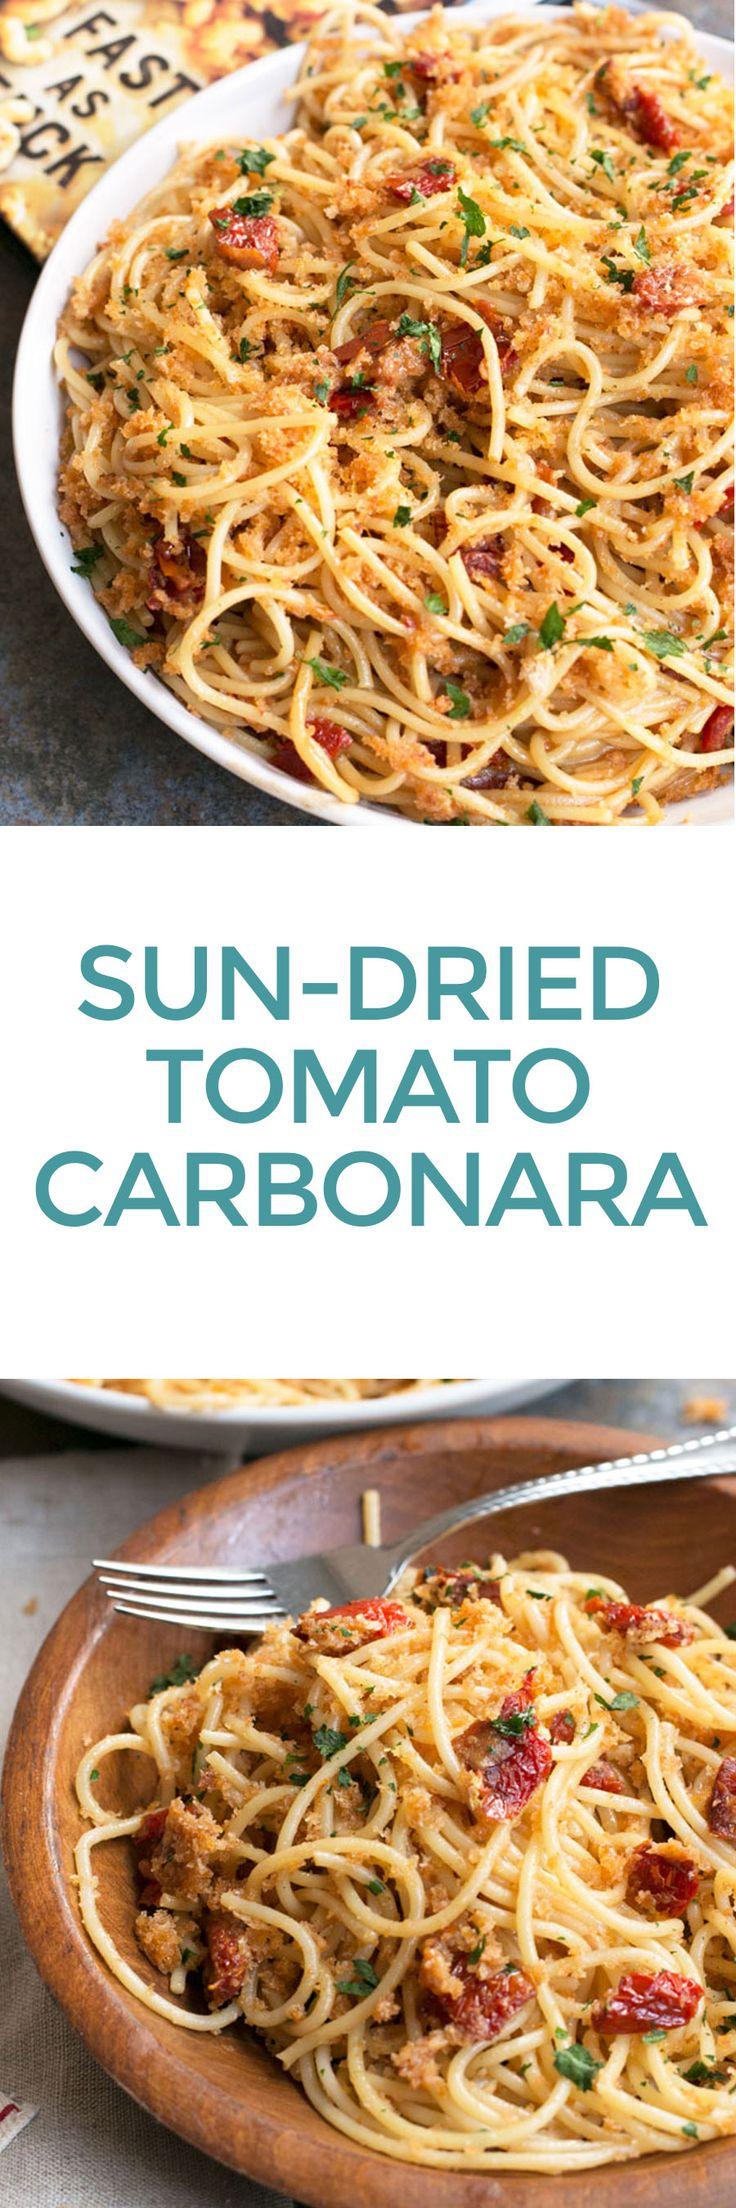 Thug Kitchen 101's Sun-Dried Tomato Carbonara   cakenknife.com